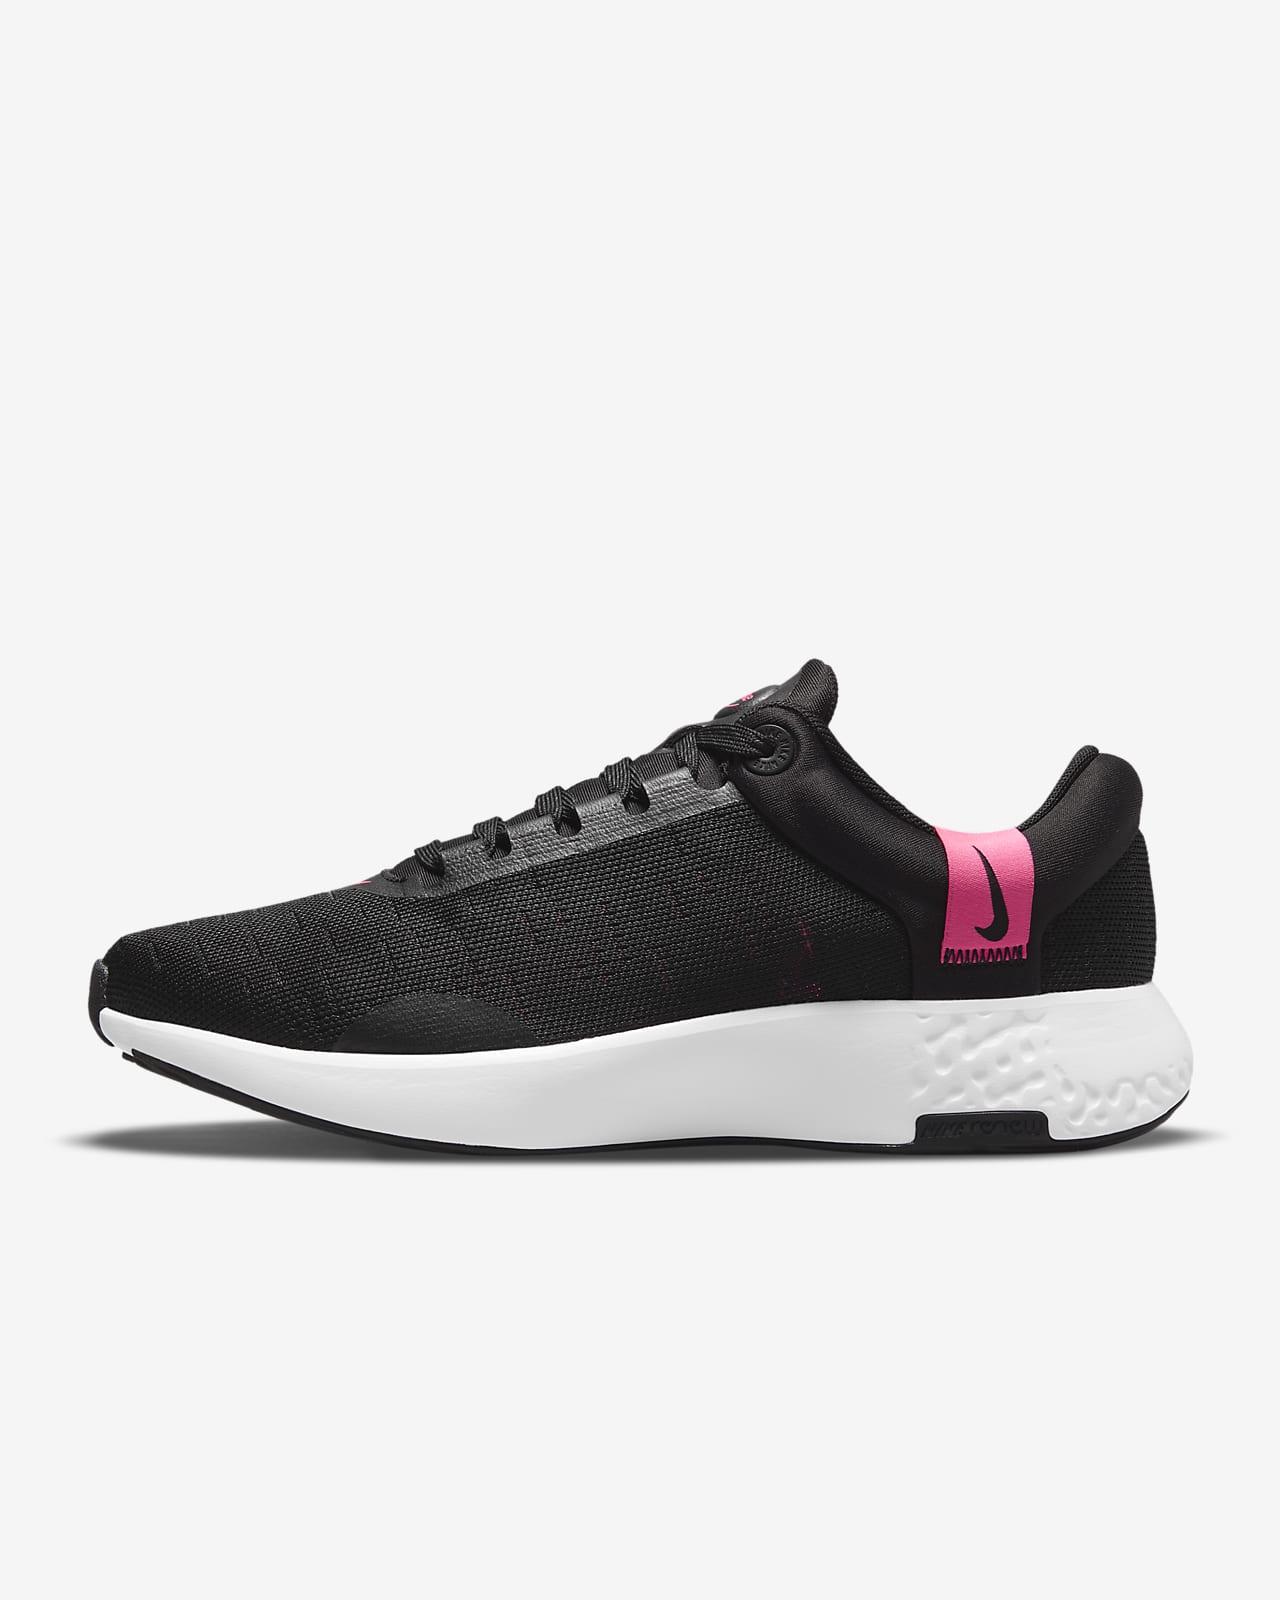 Chaussures de running sur route Nike Renew Serenity Run pour Femme